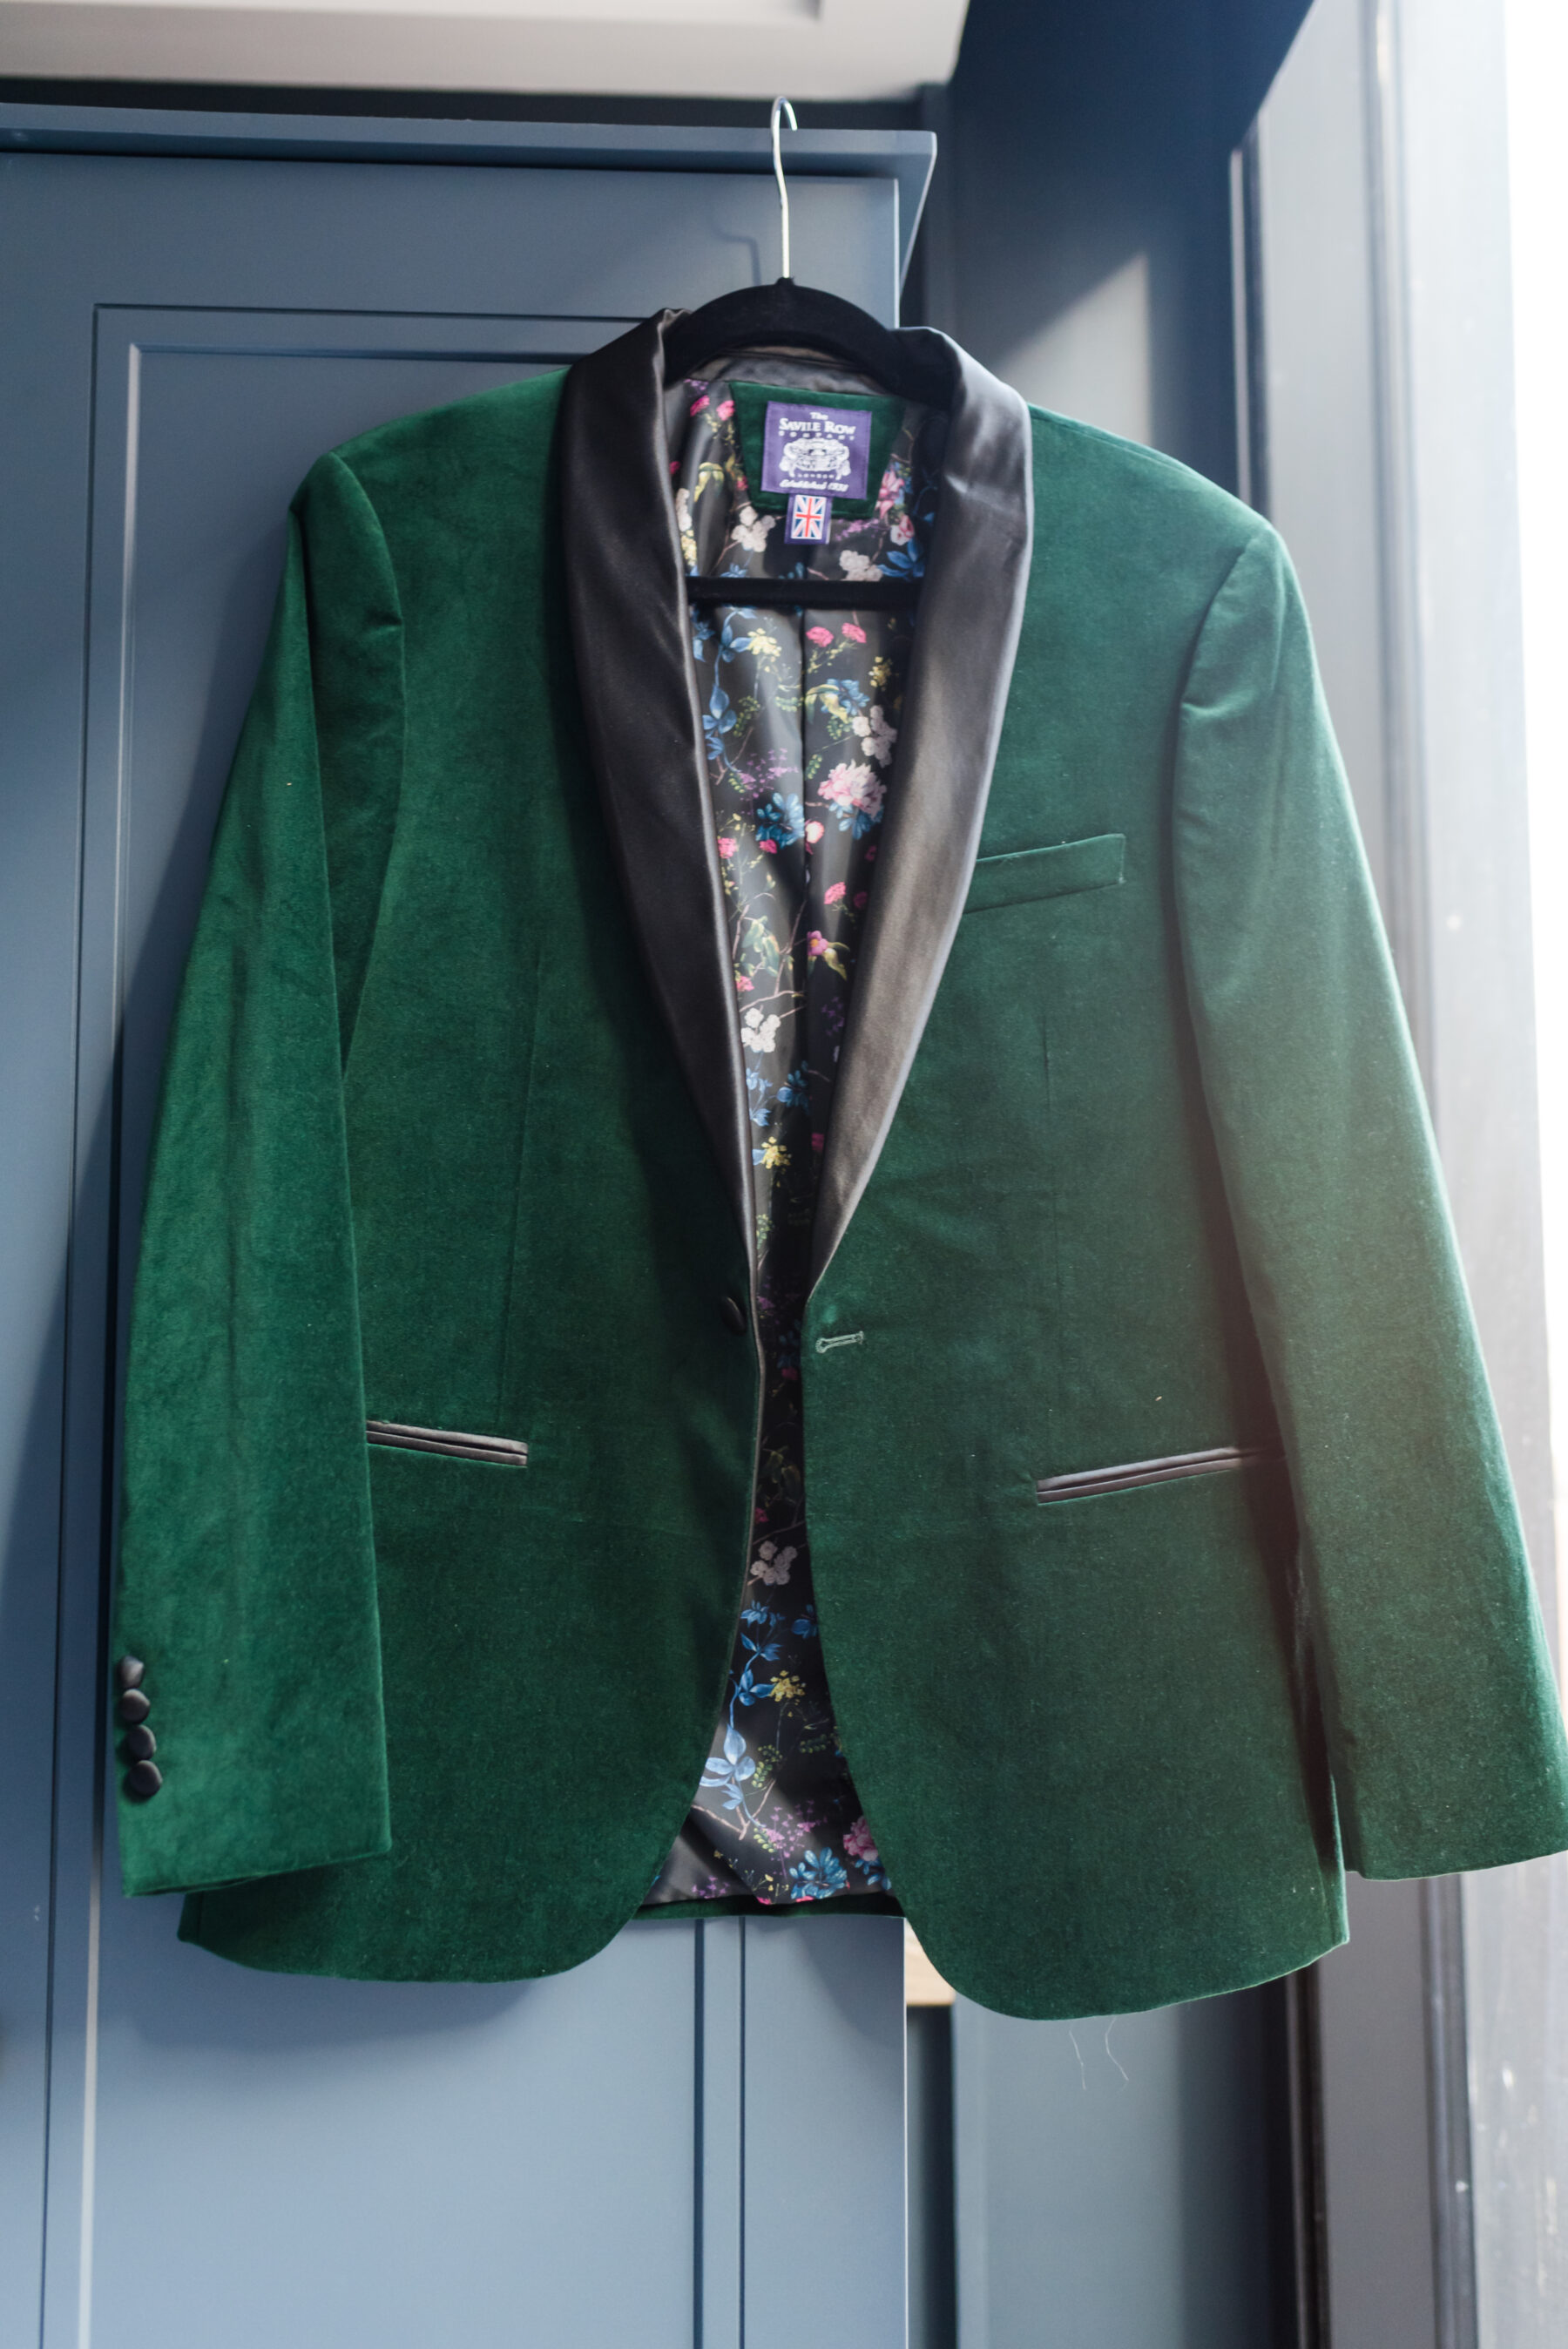 Green wedding suit jacket